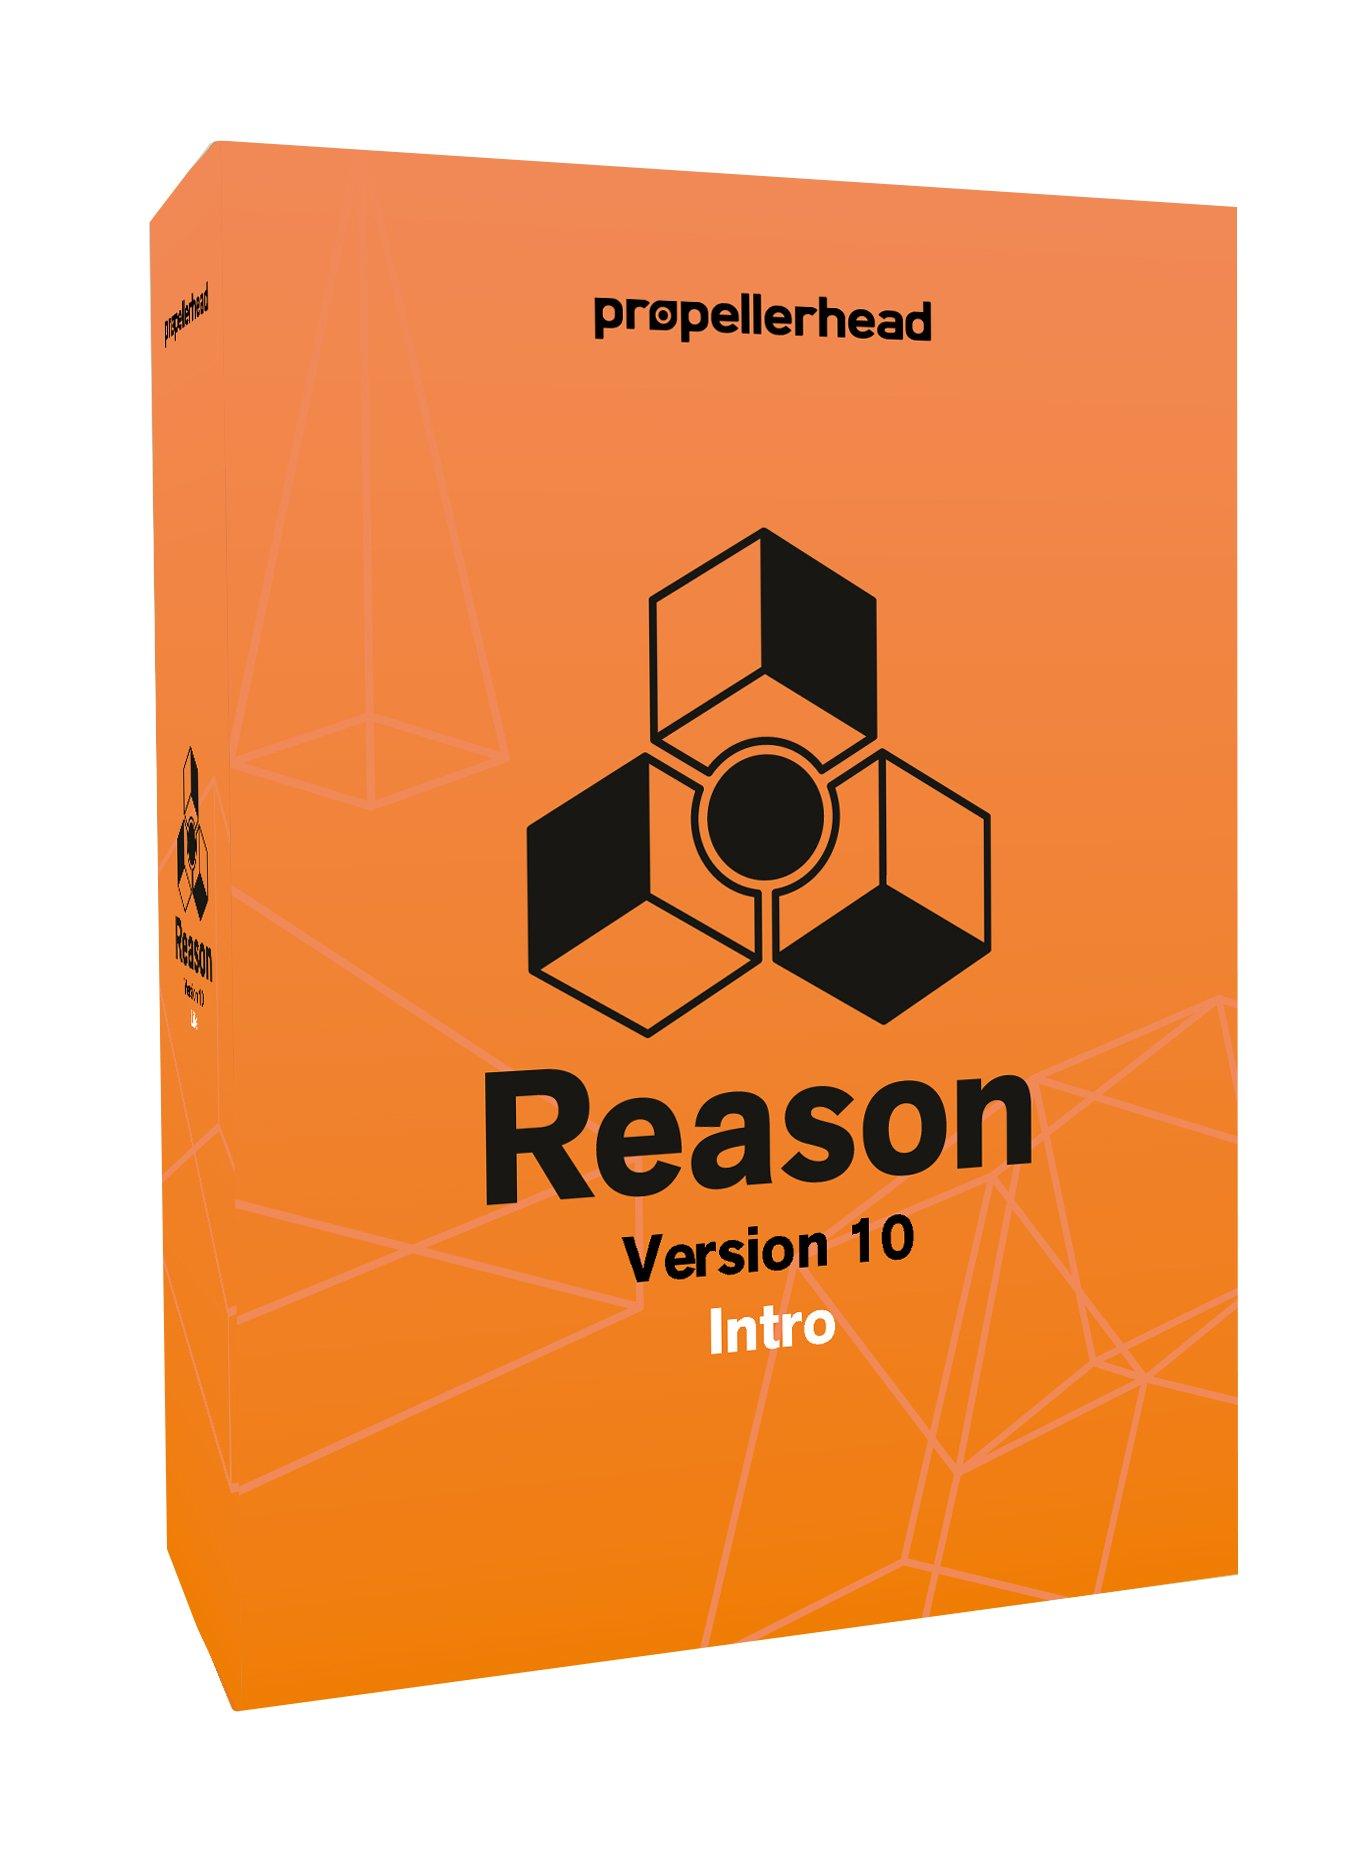 Propellerhead Multitrack Recording Software (Intro 10) by Propellerhead